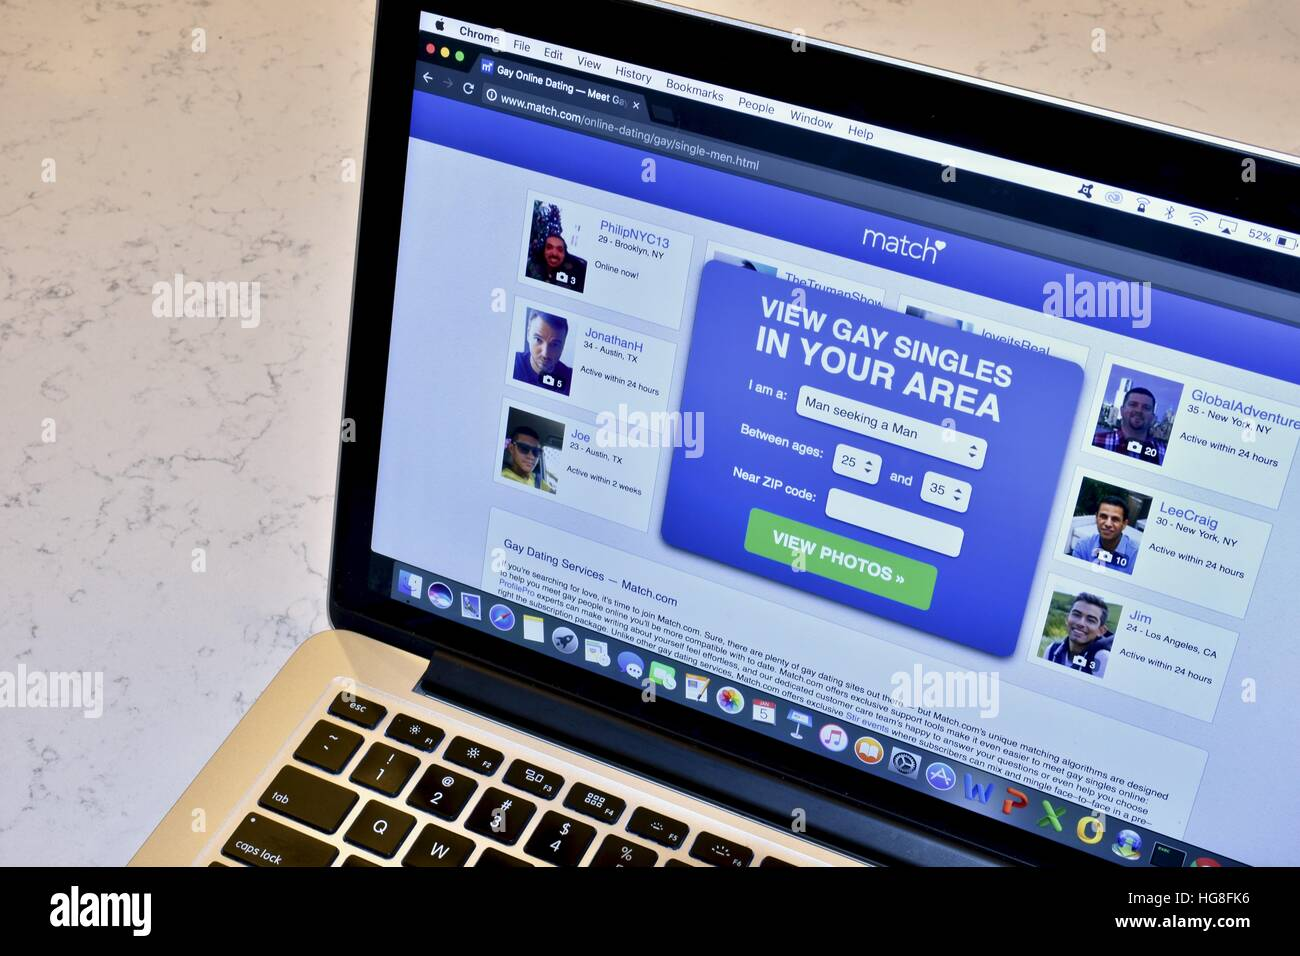 Angeles Dating-Website